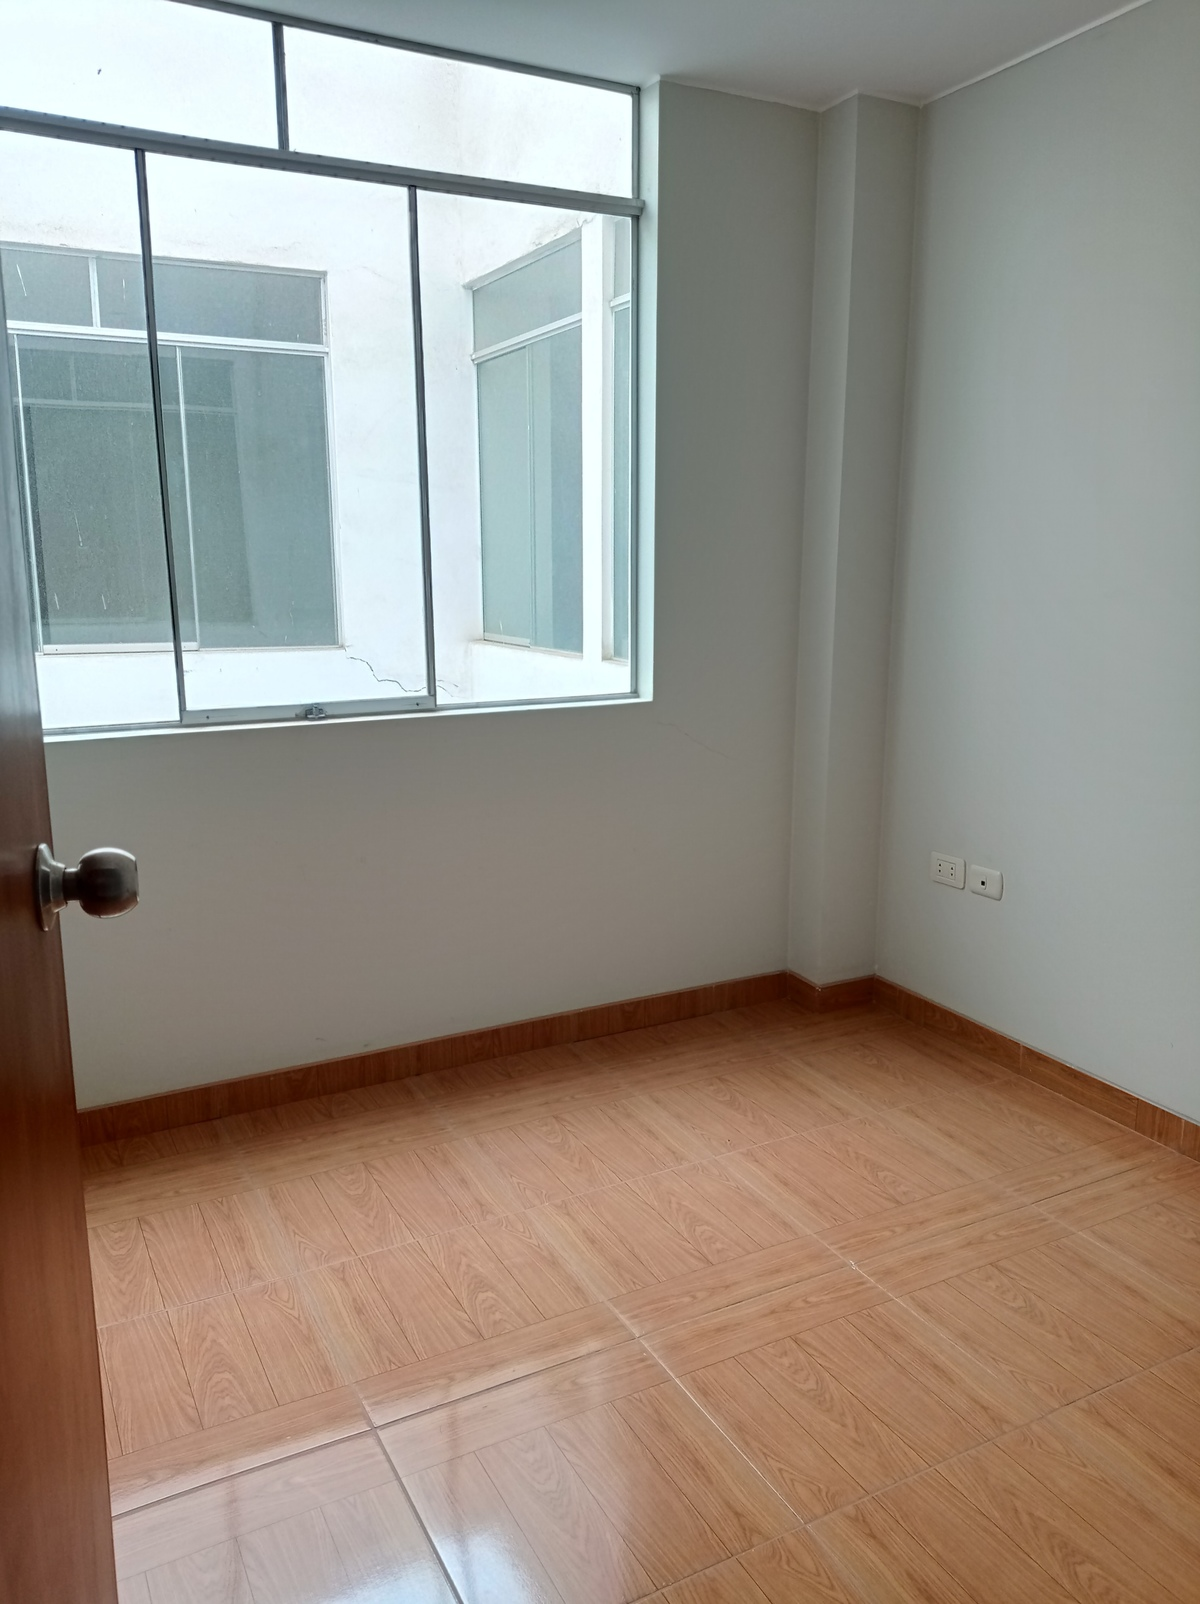 4 de 10: Habitación amplia con ventana